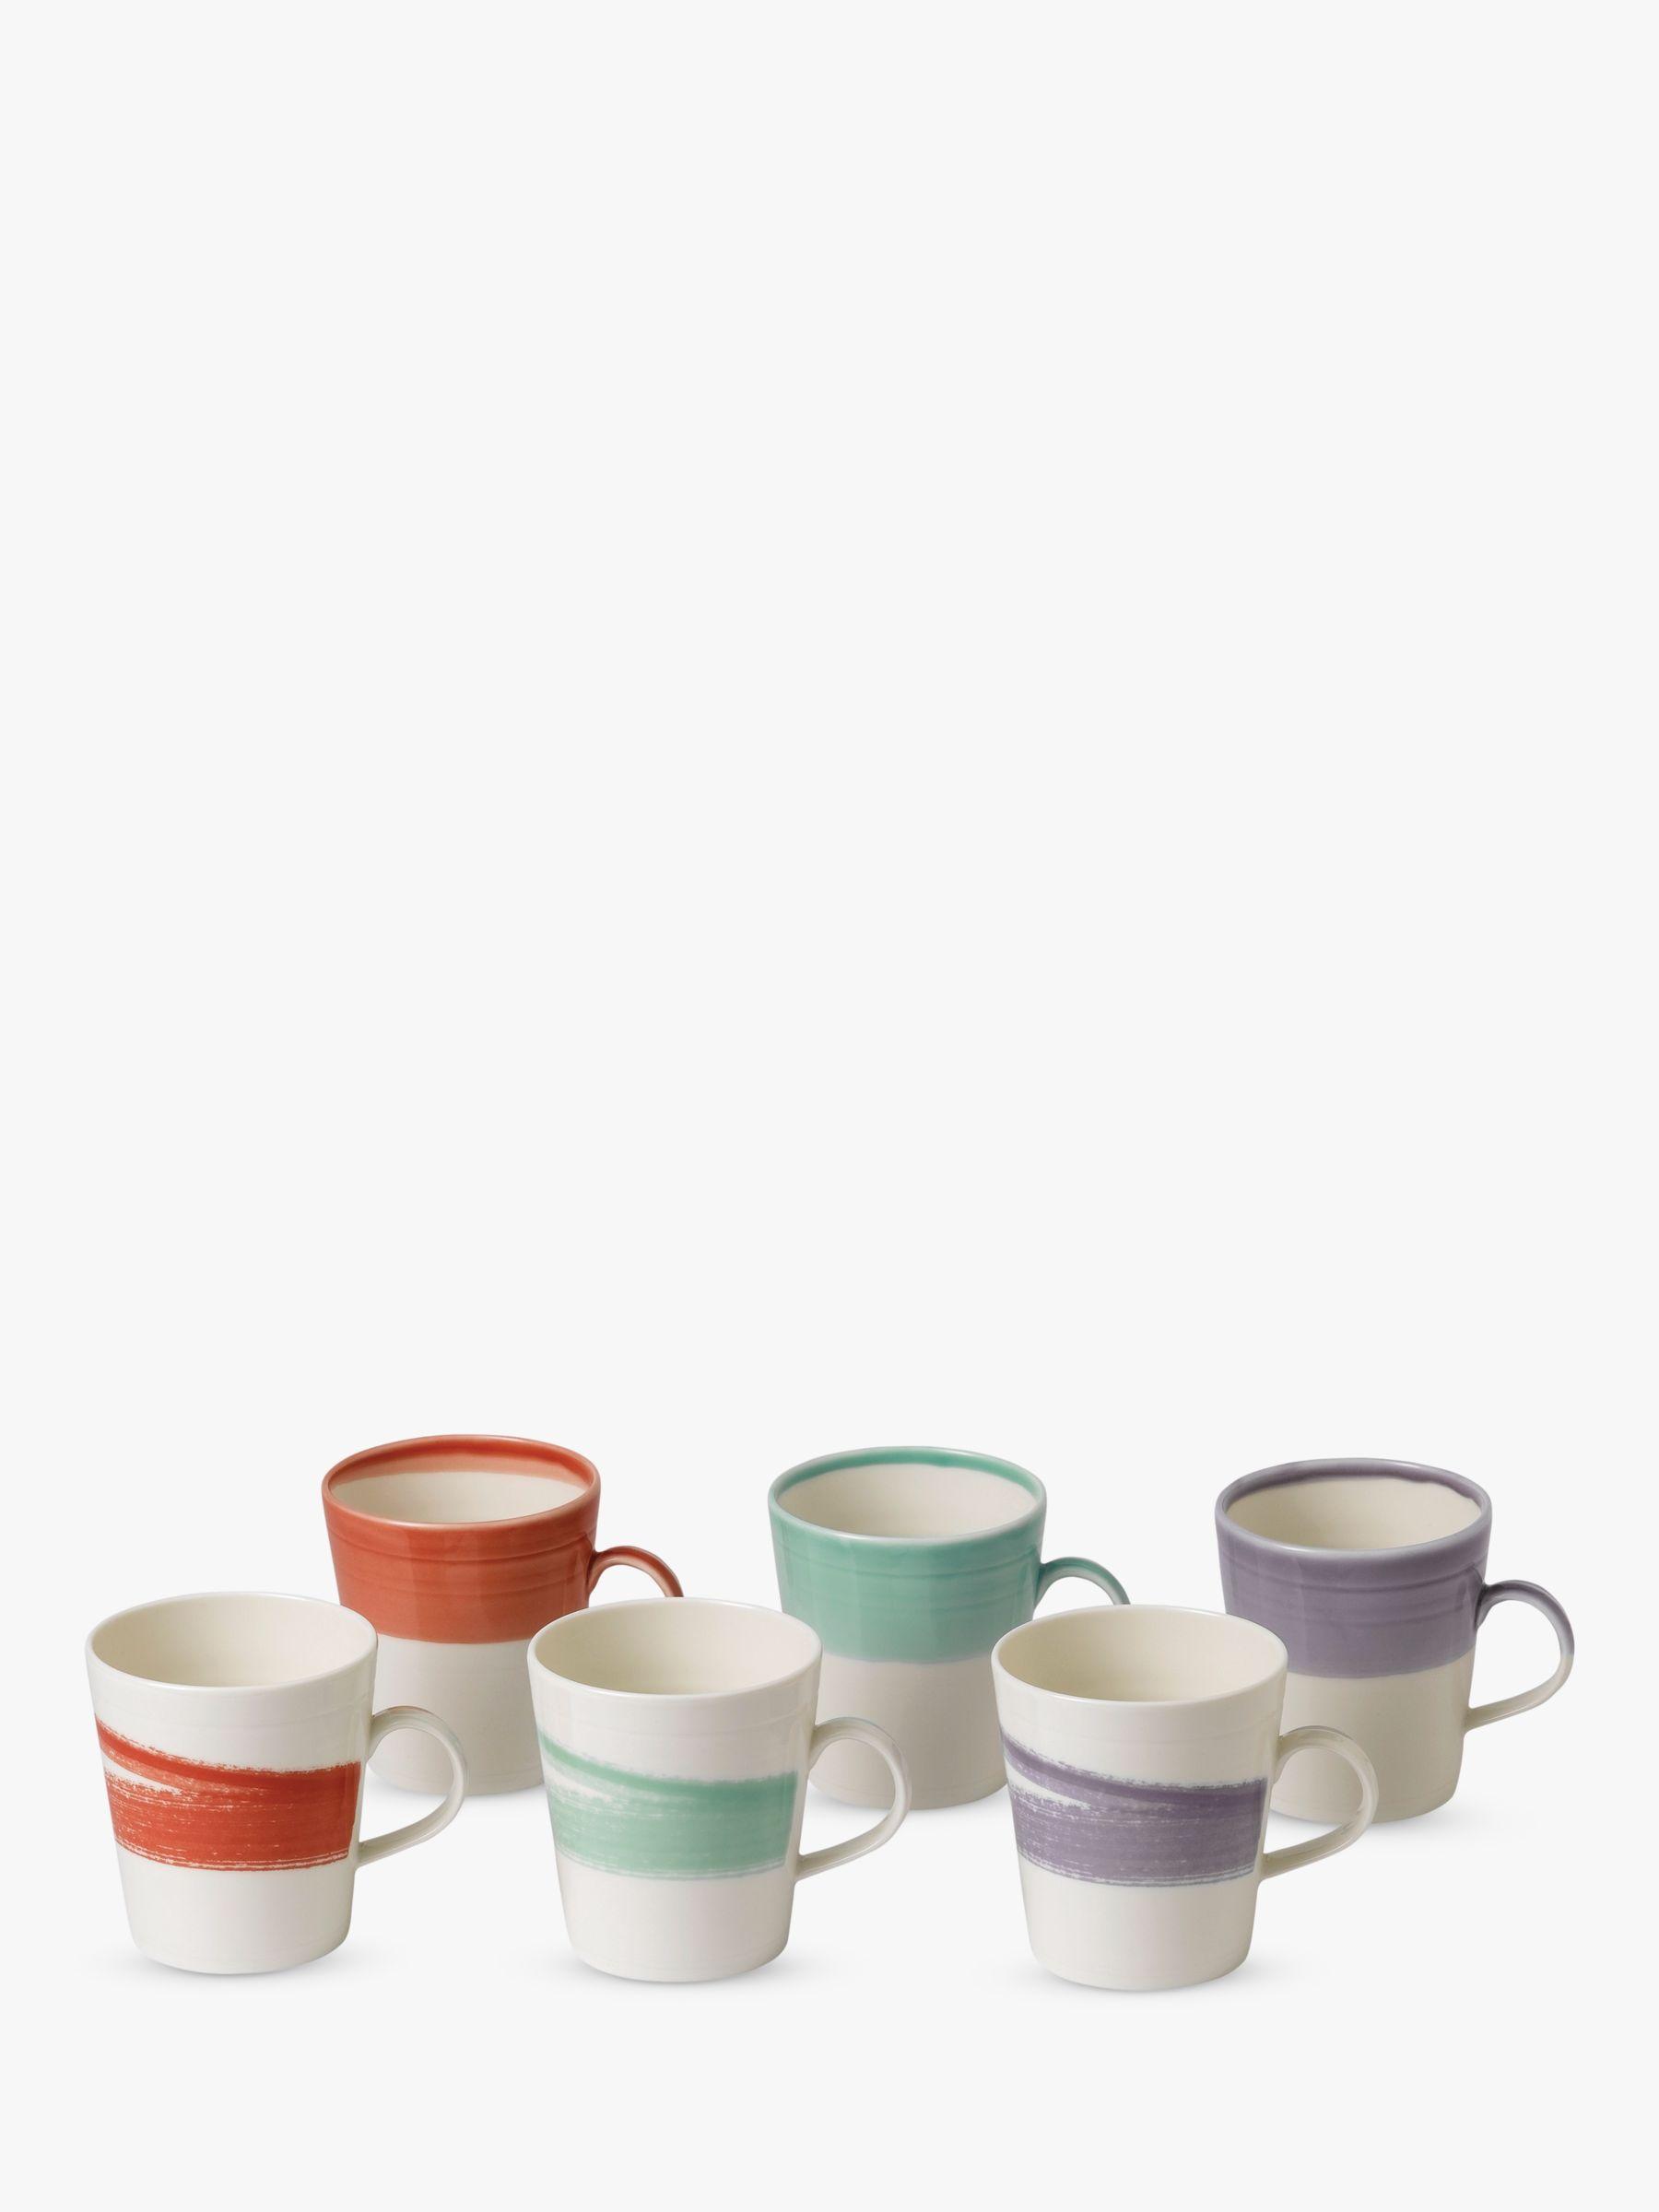 Royal Doulton Royal Doulton 1815 Bold Large Mugs, Set of 6, 500ml, Assorted